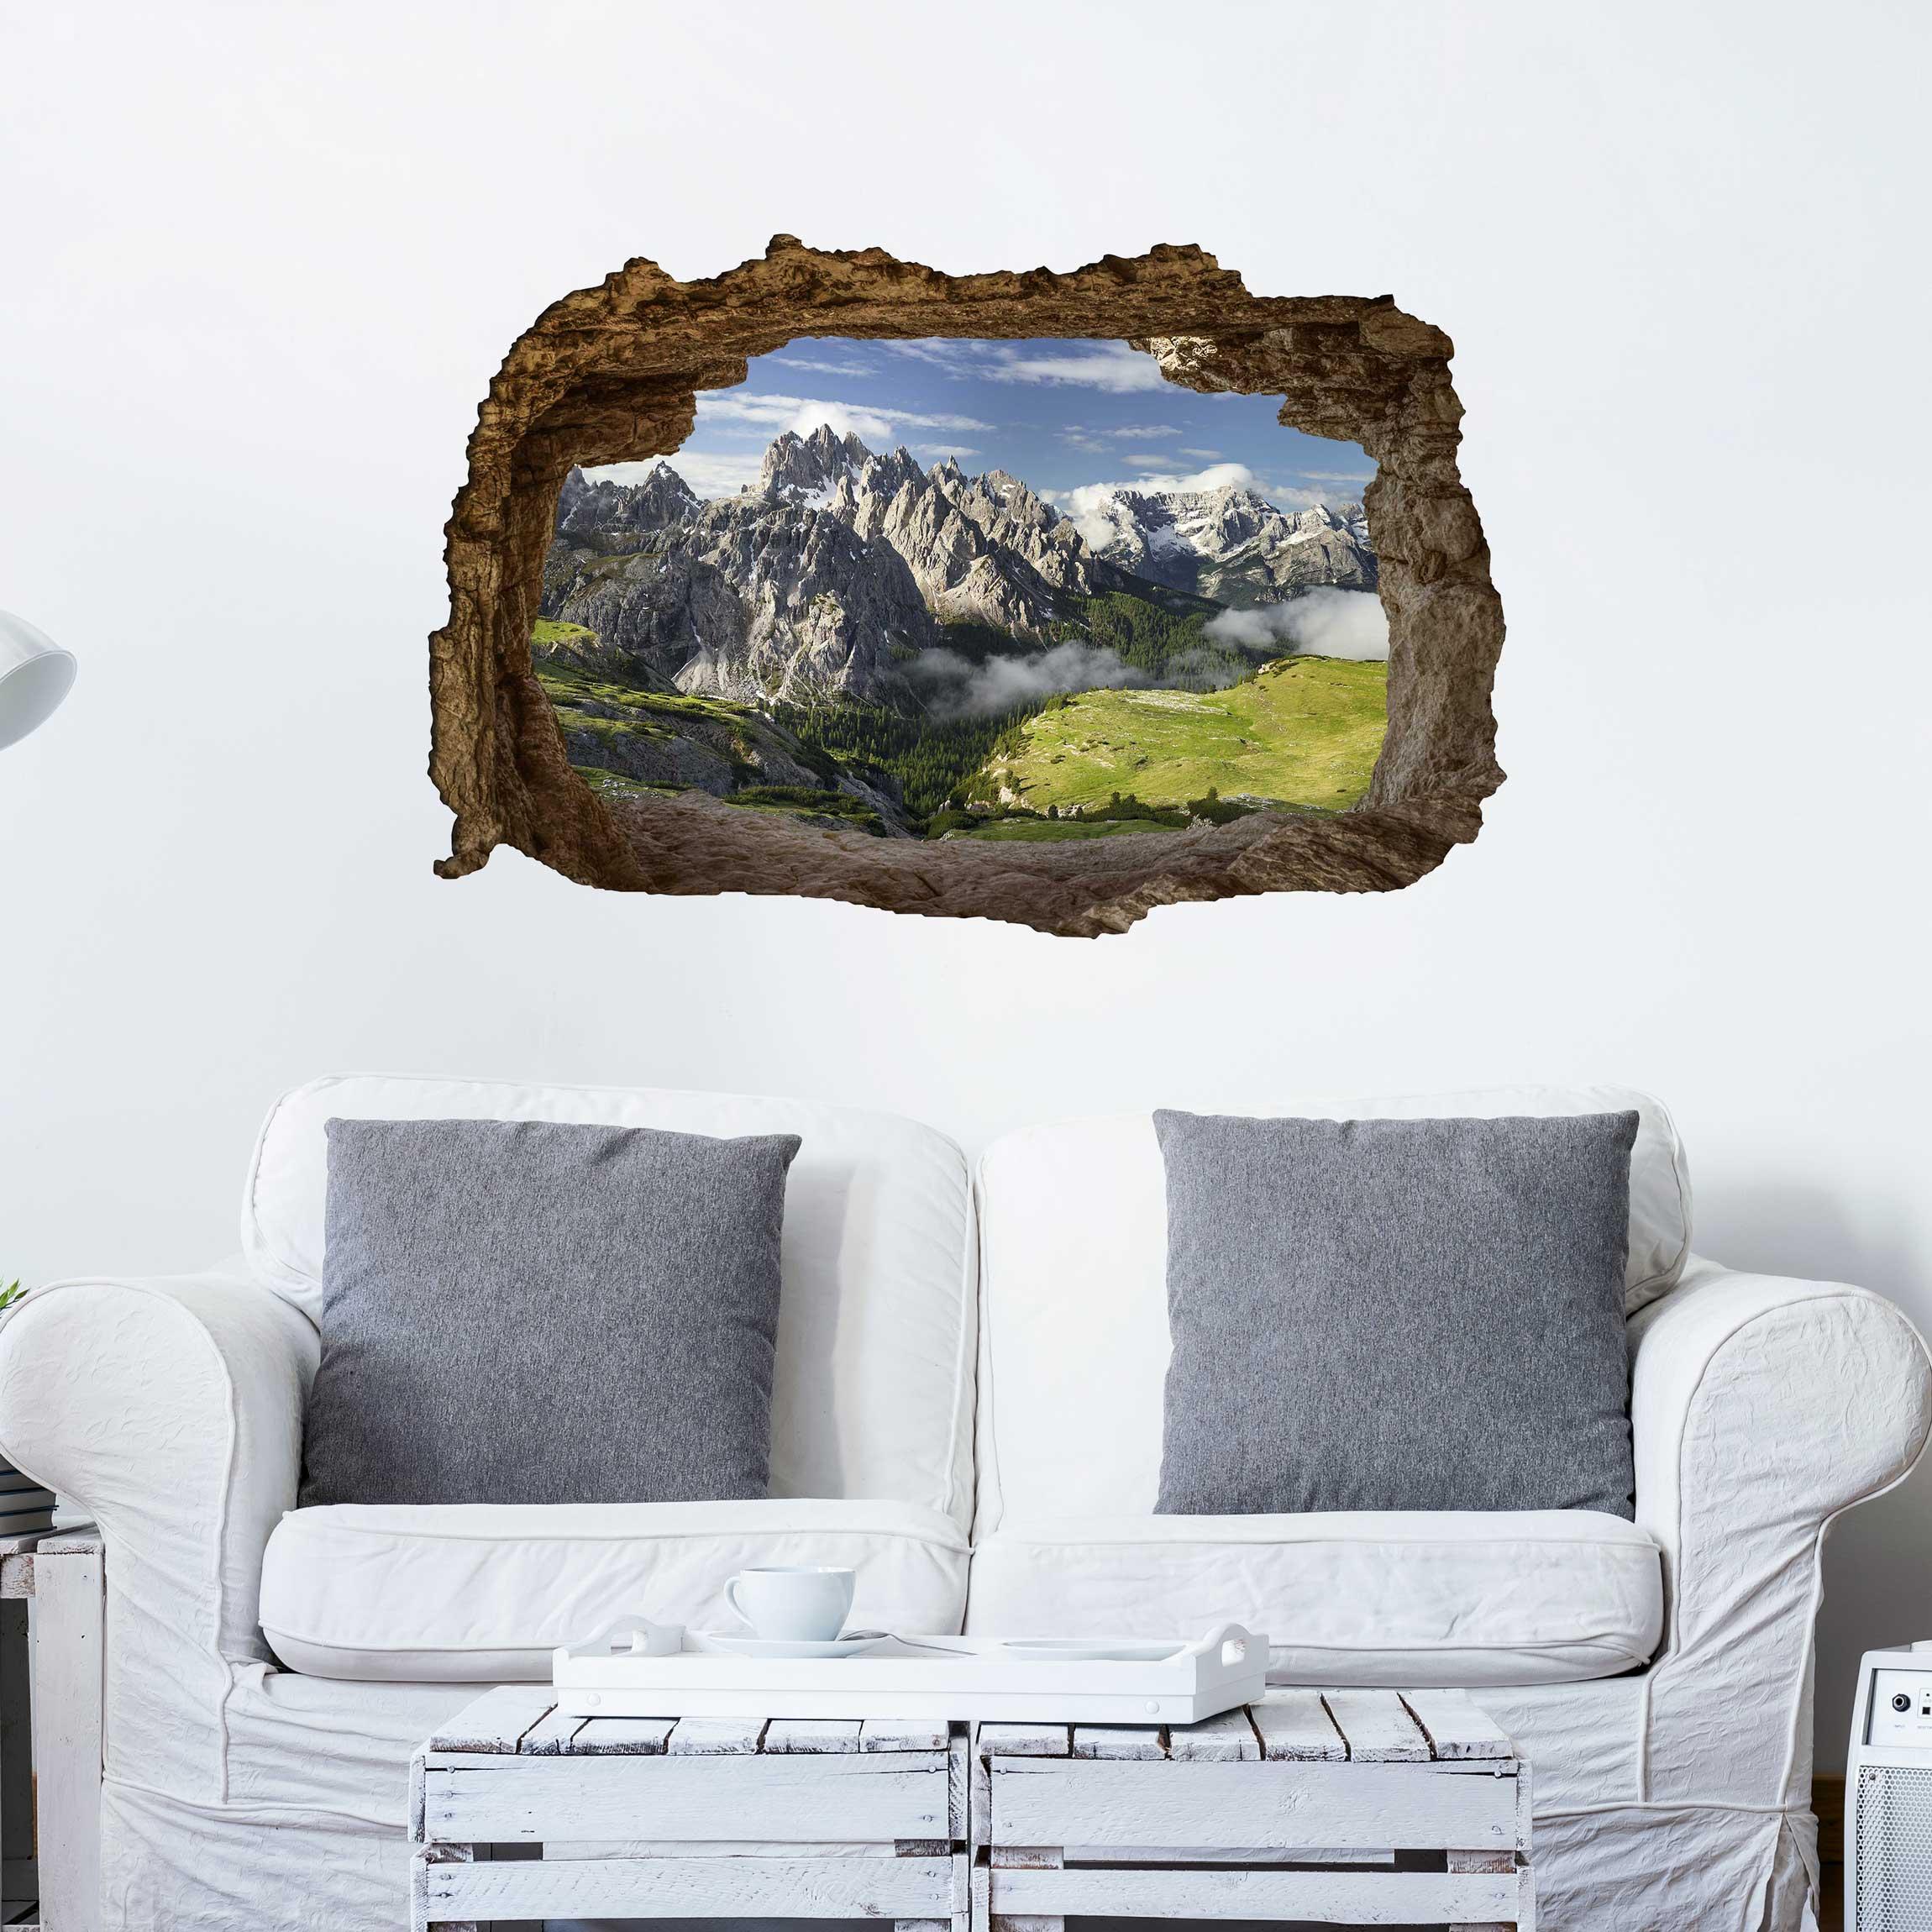 3d wandtattoo italienische alpen quer 2 3. Black Bedroom Furniture Sets. Home Design Ideas